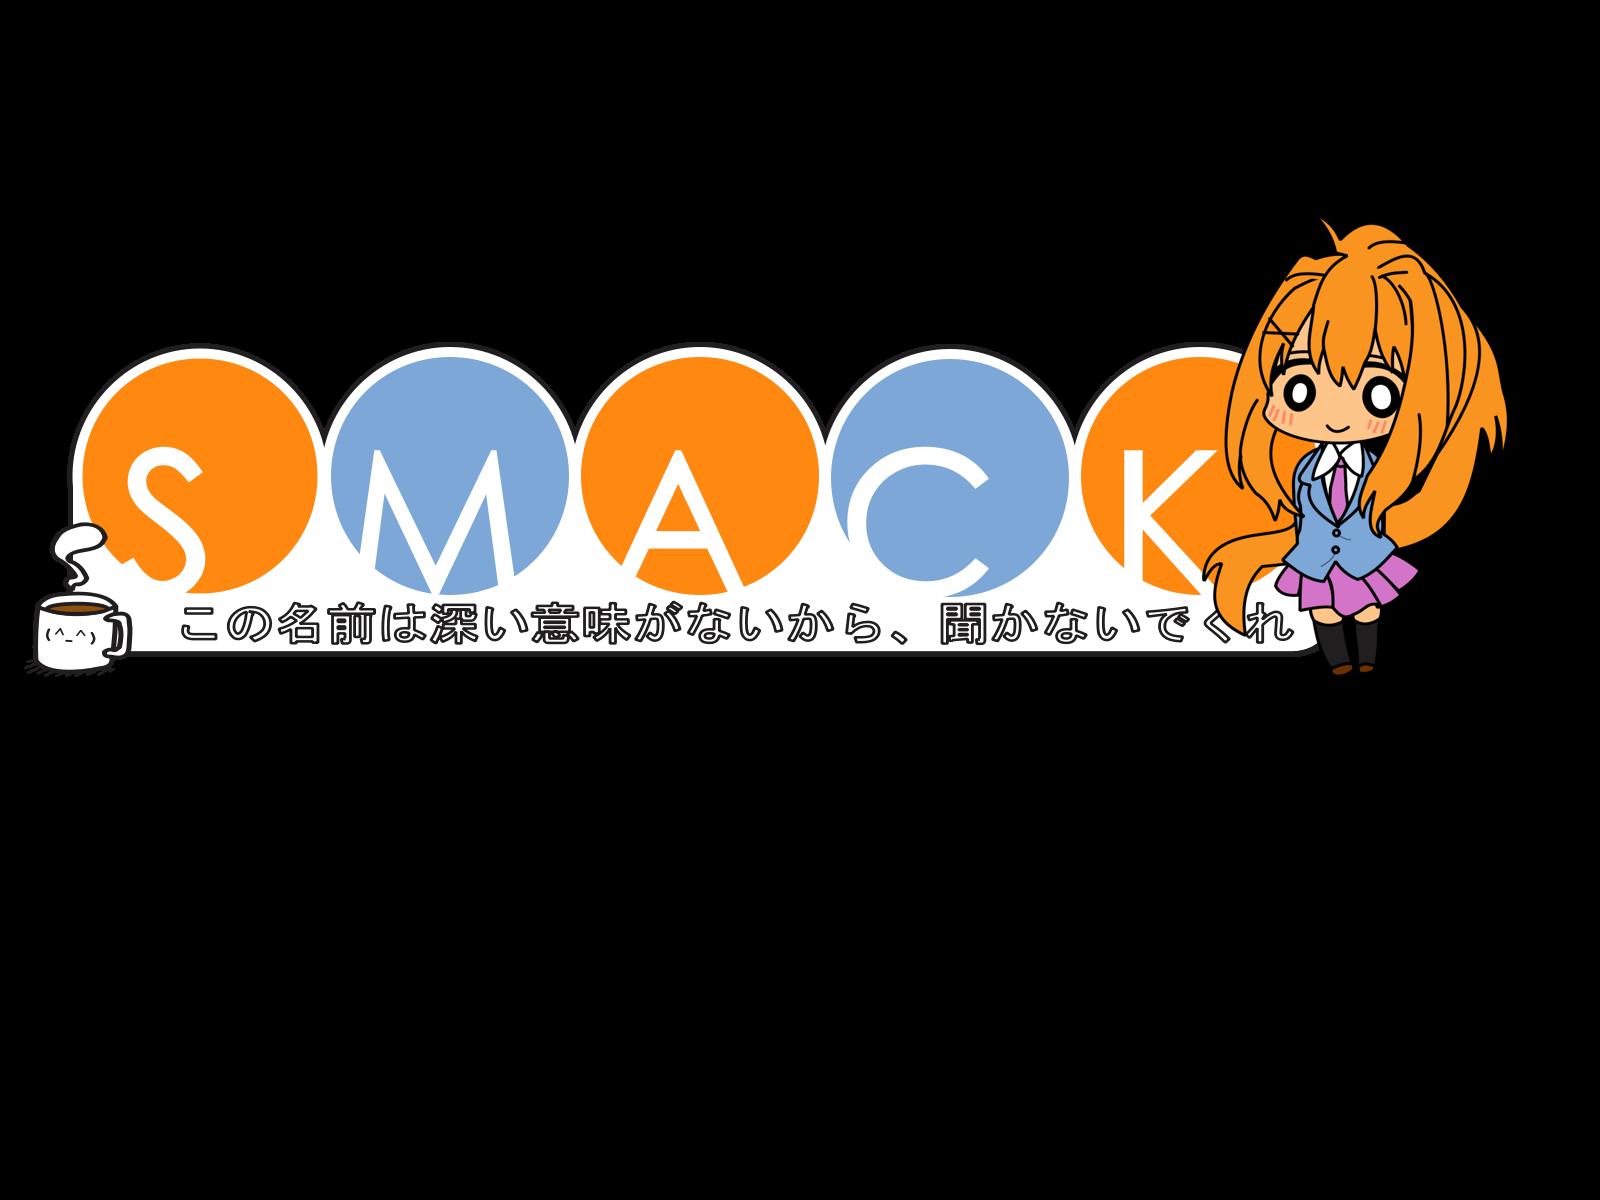 s mack